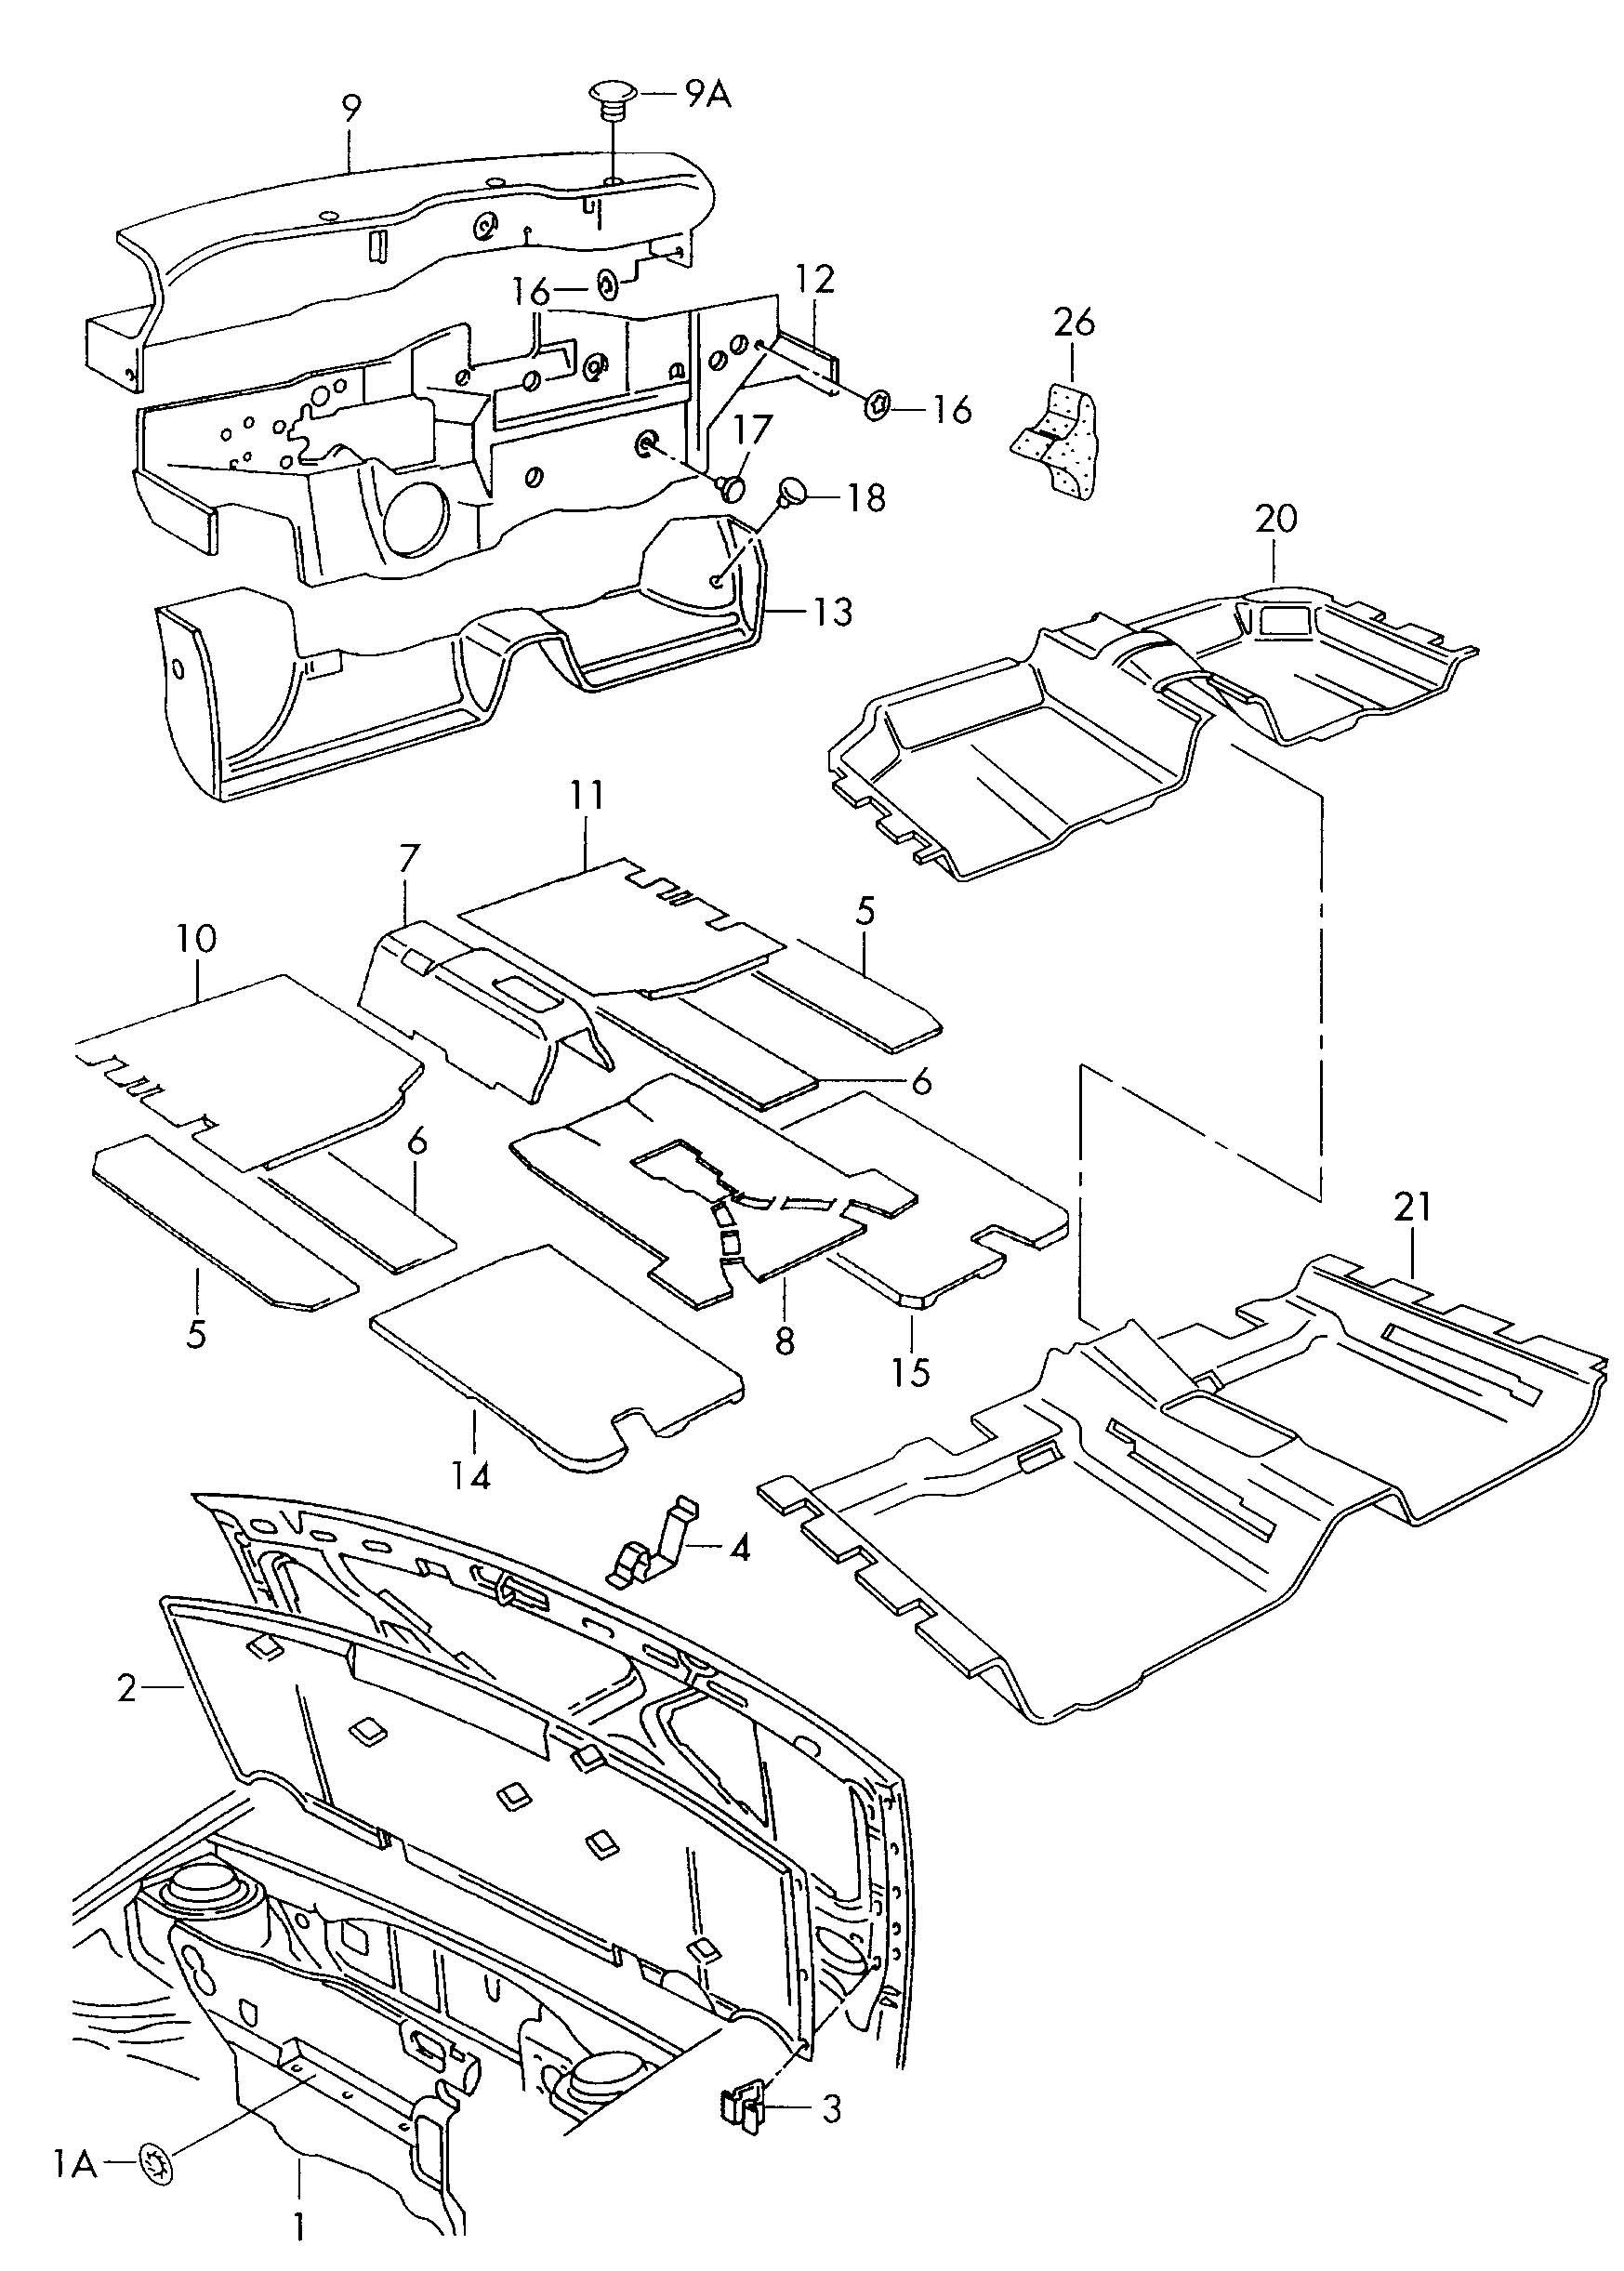 Volkswagen Jetta Sound Absorber For Floor Aound Absorber